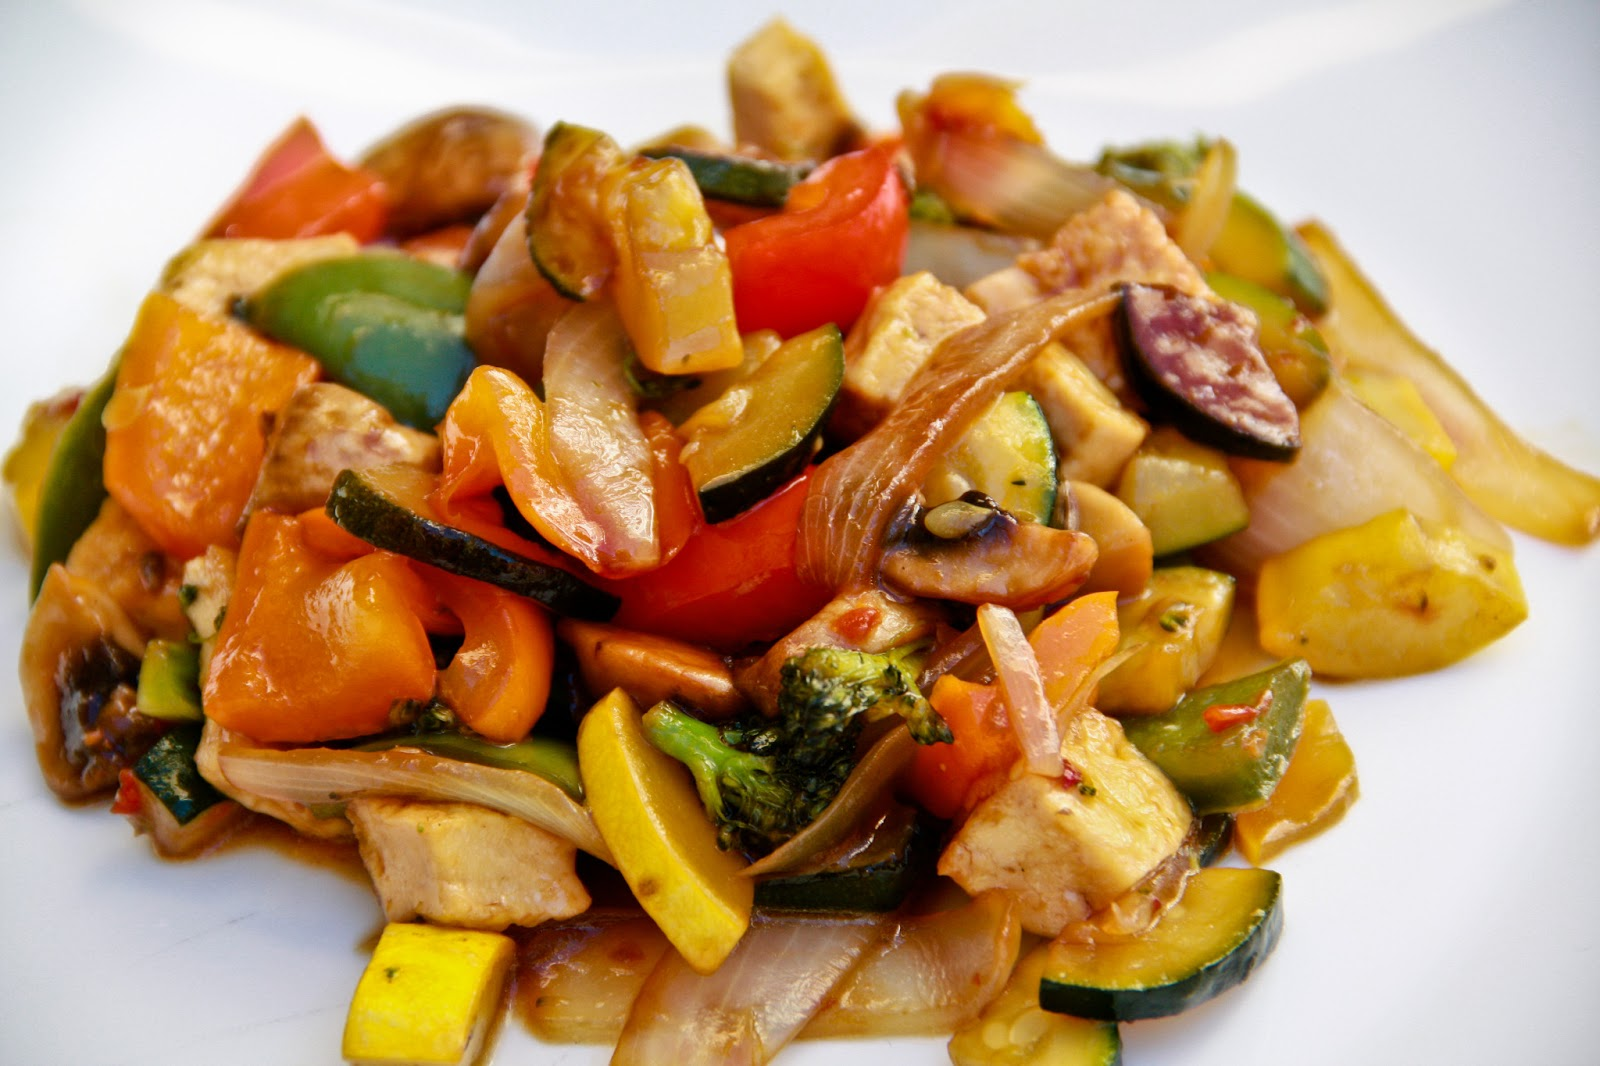 Tofu Veggie Stir Fry (vegan, gluten-free) - Vegetarian Gastronomy